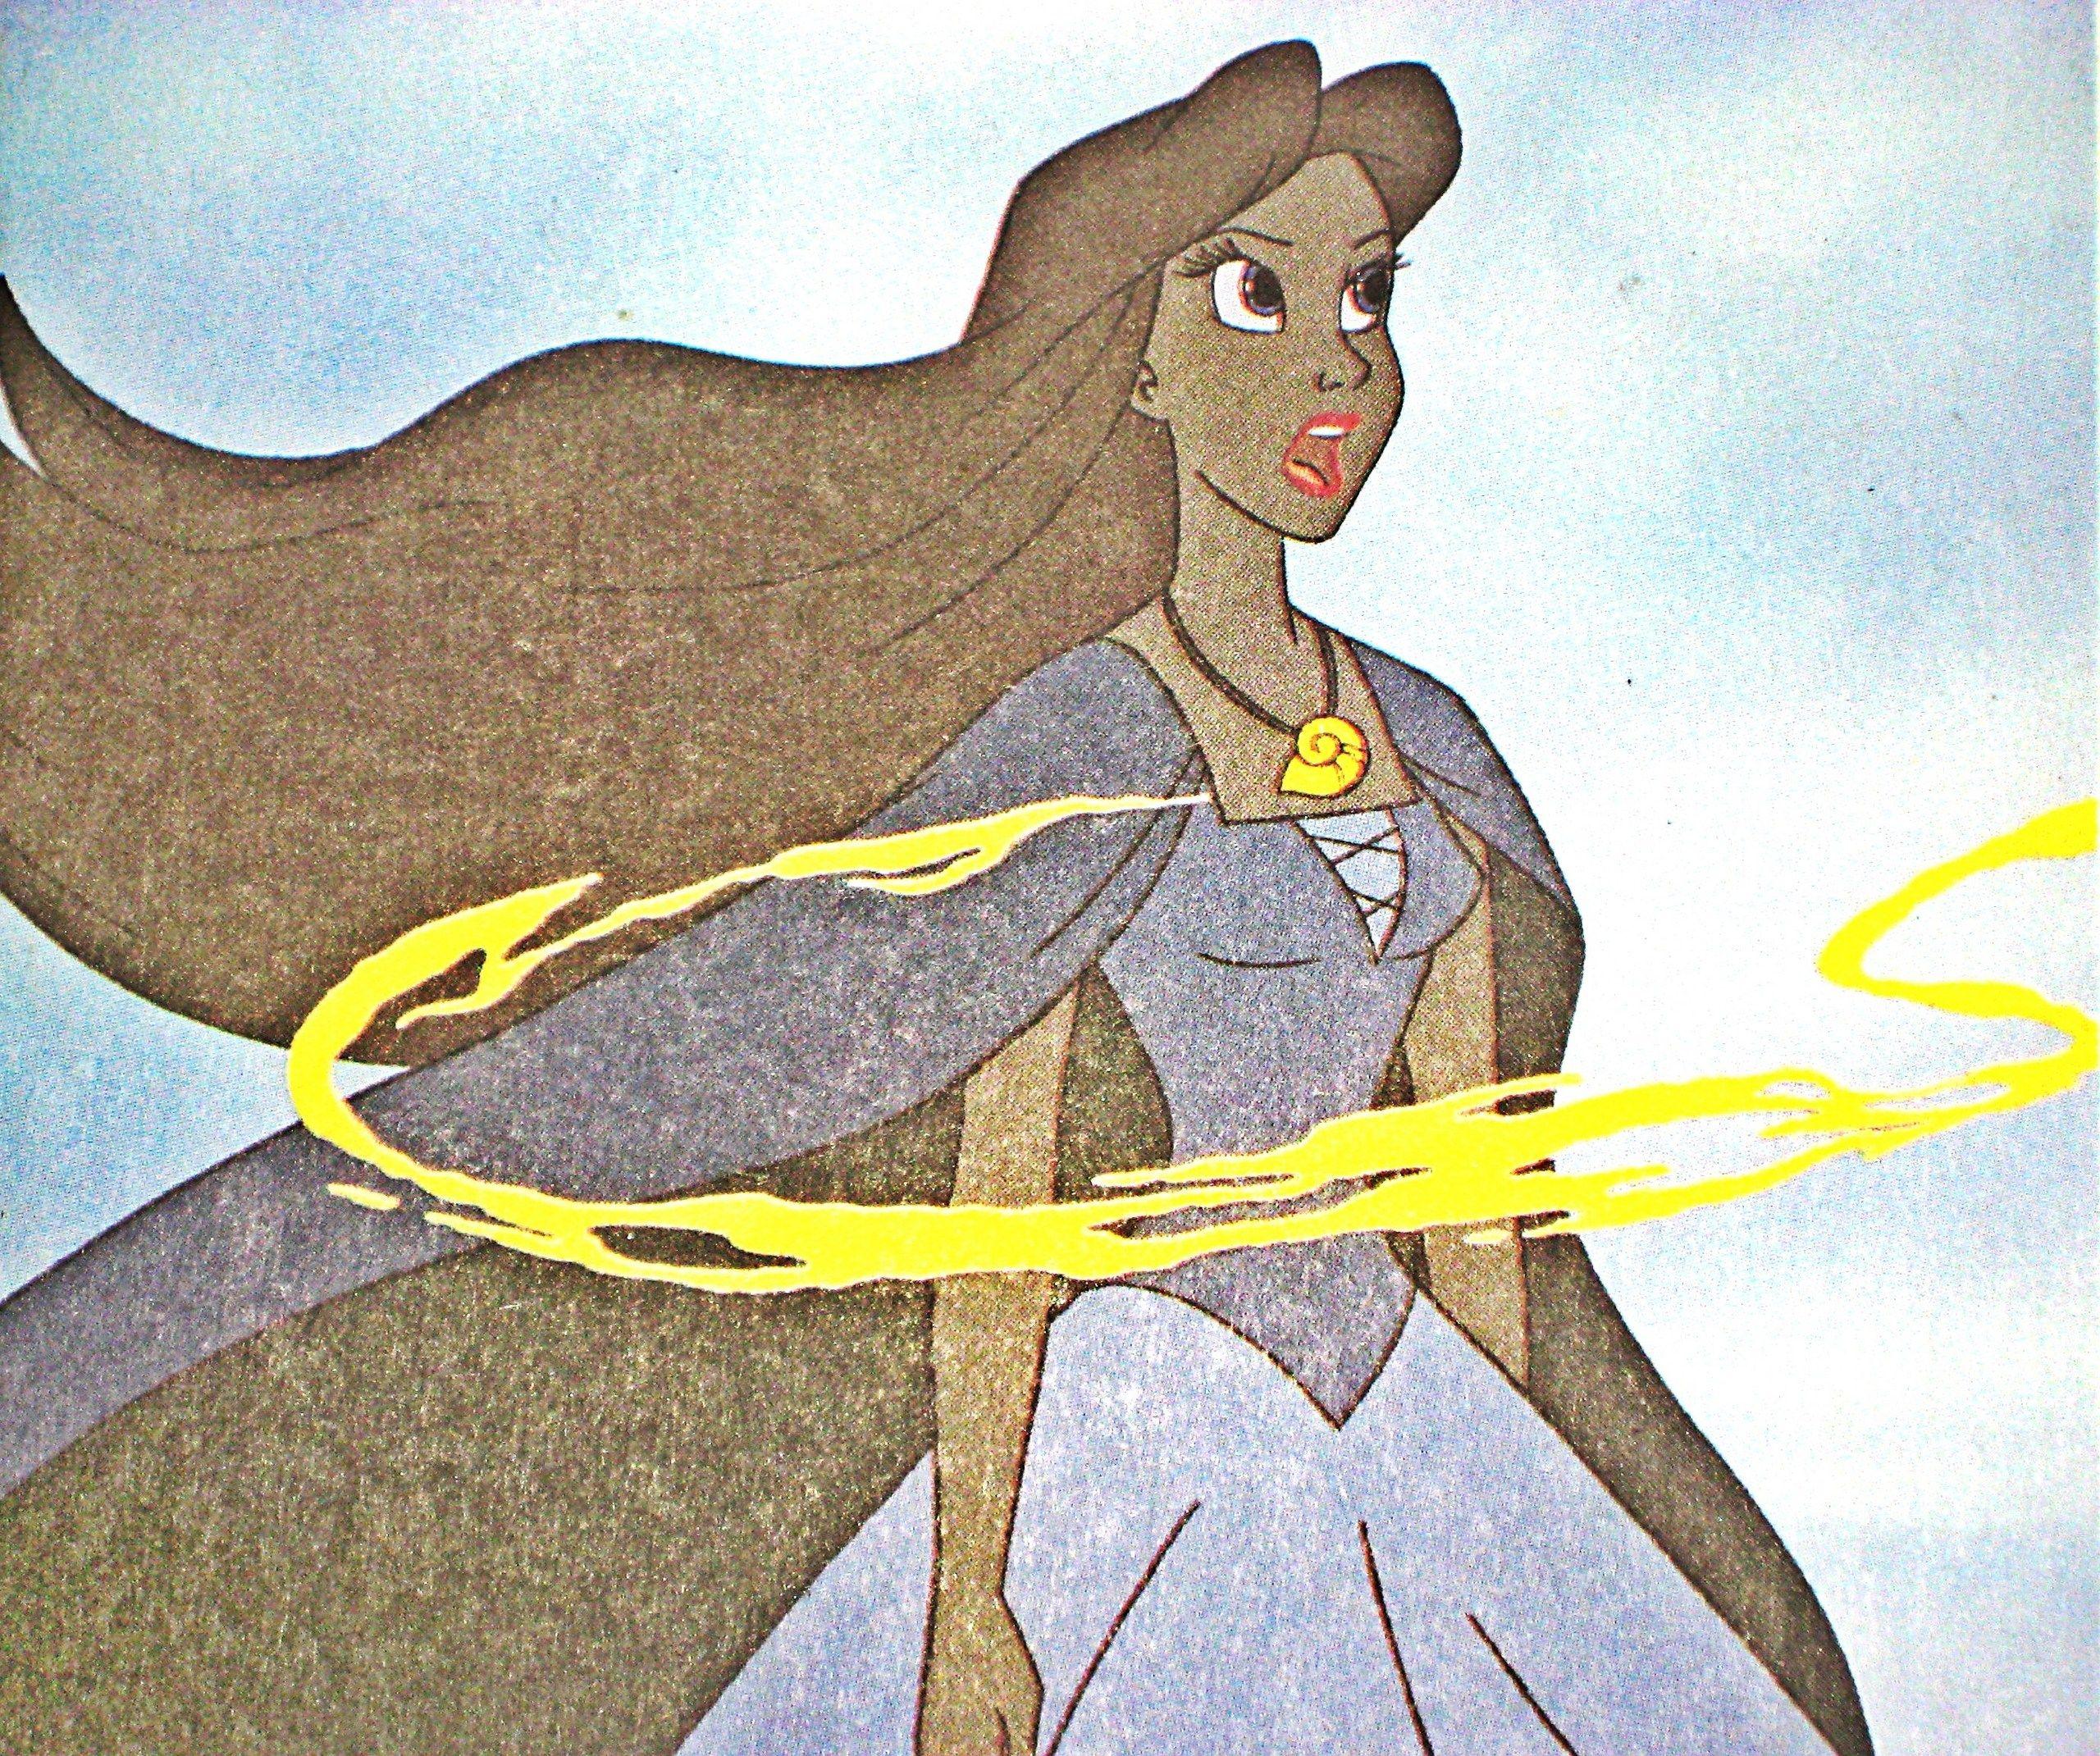 Walt-Disney-Production-Photos-Vanessa-vanessa-from-the-little-mermaid-24127516-2560-2141.jpg (Imagen JPEG, 2560 × 2141 píxeles) - Escalado (31 %)